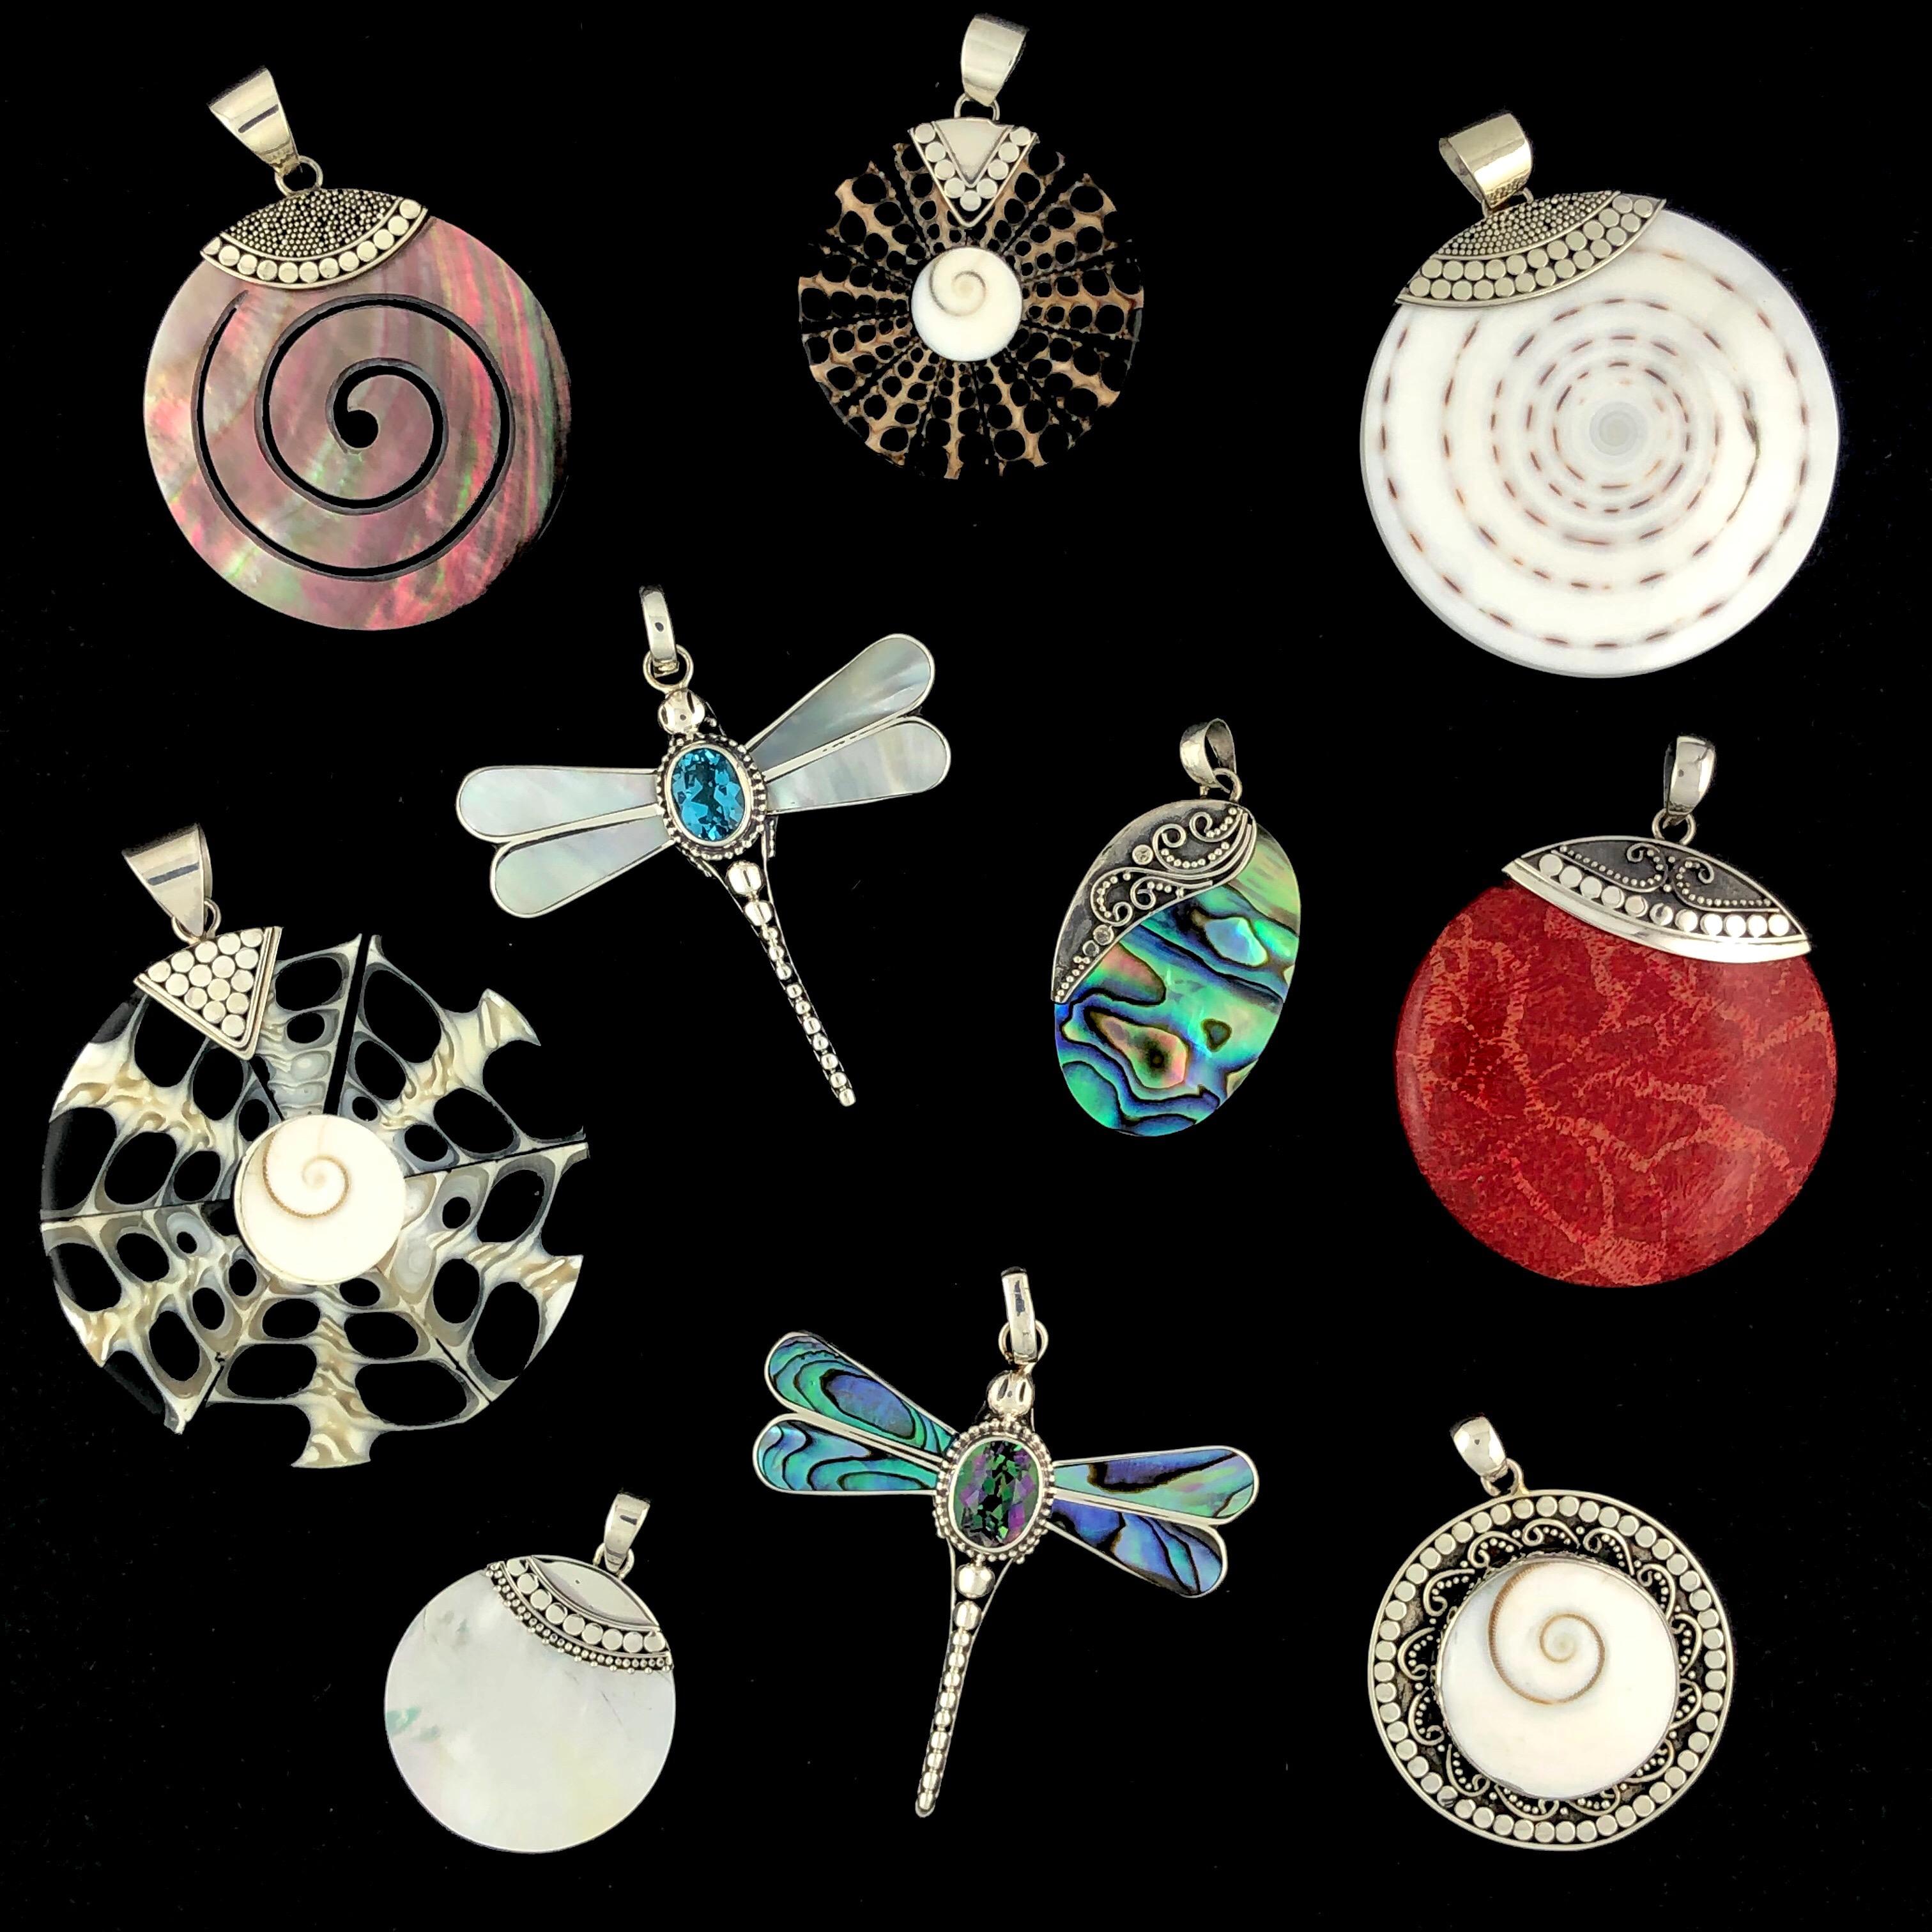 Balinese Jewelry